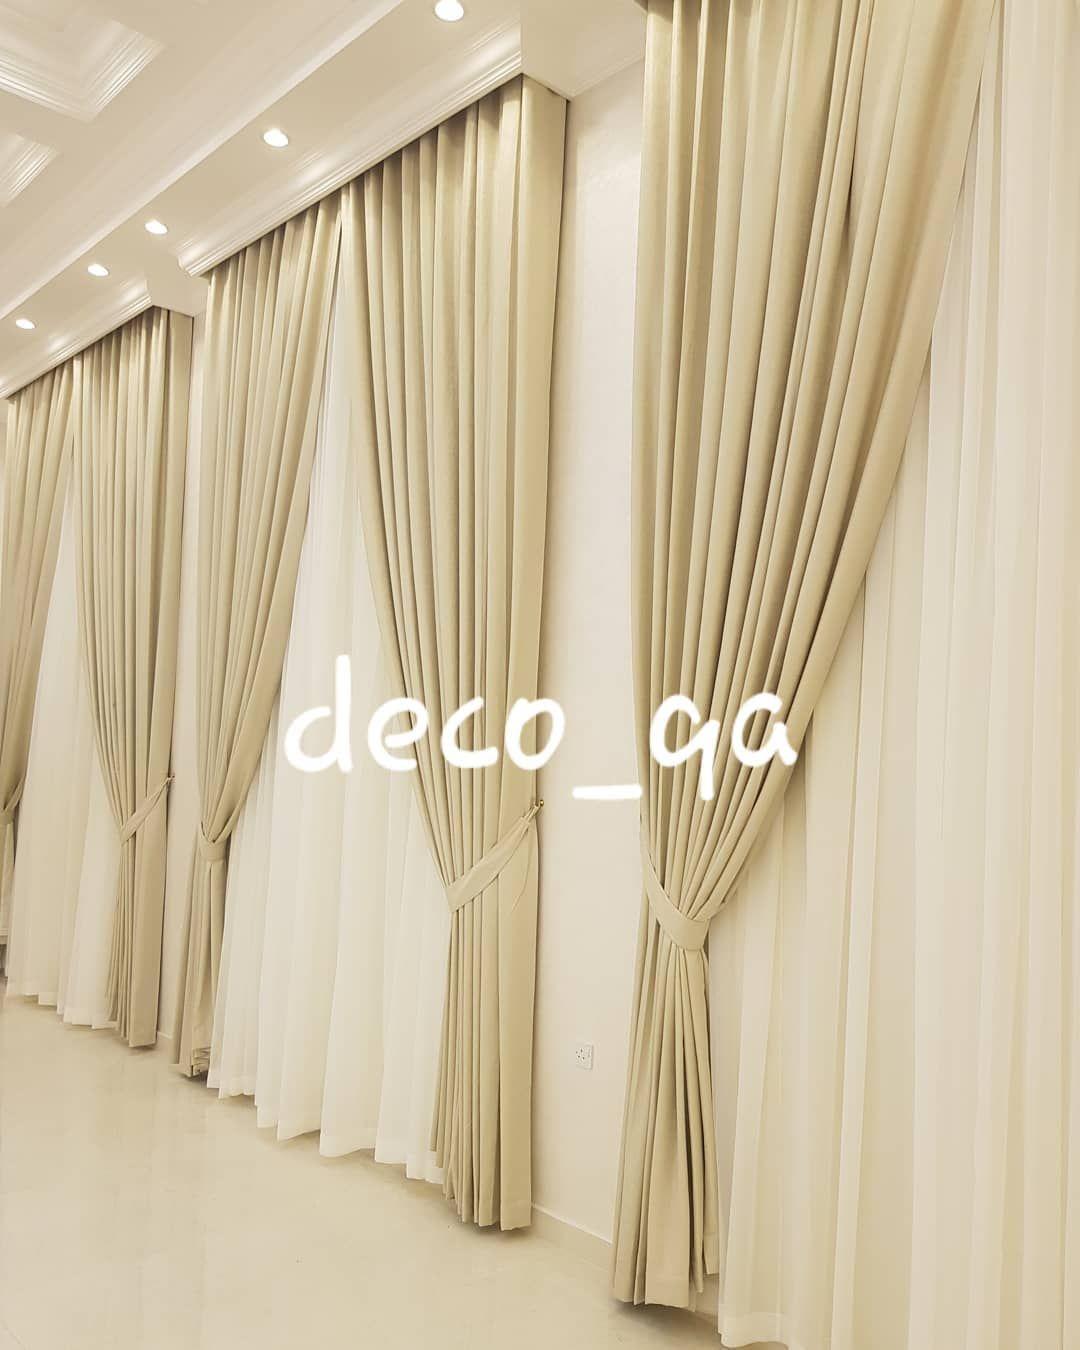 ديكورات ستائر كنب قطر جلسات اثاث خشب الدوحة سجاد موكيت غرف نوم سرير اضافات غرف جلوس Doha Furniture Design Deco Furniture Design Deco Furniture